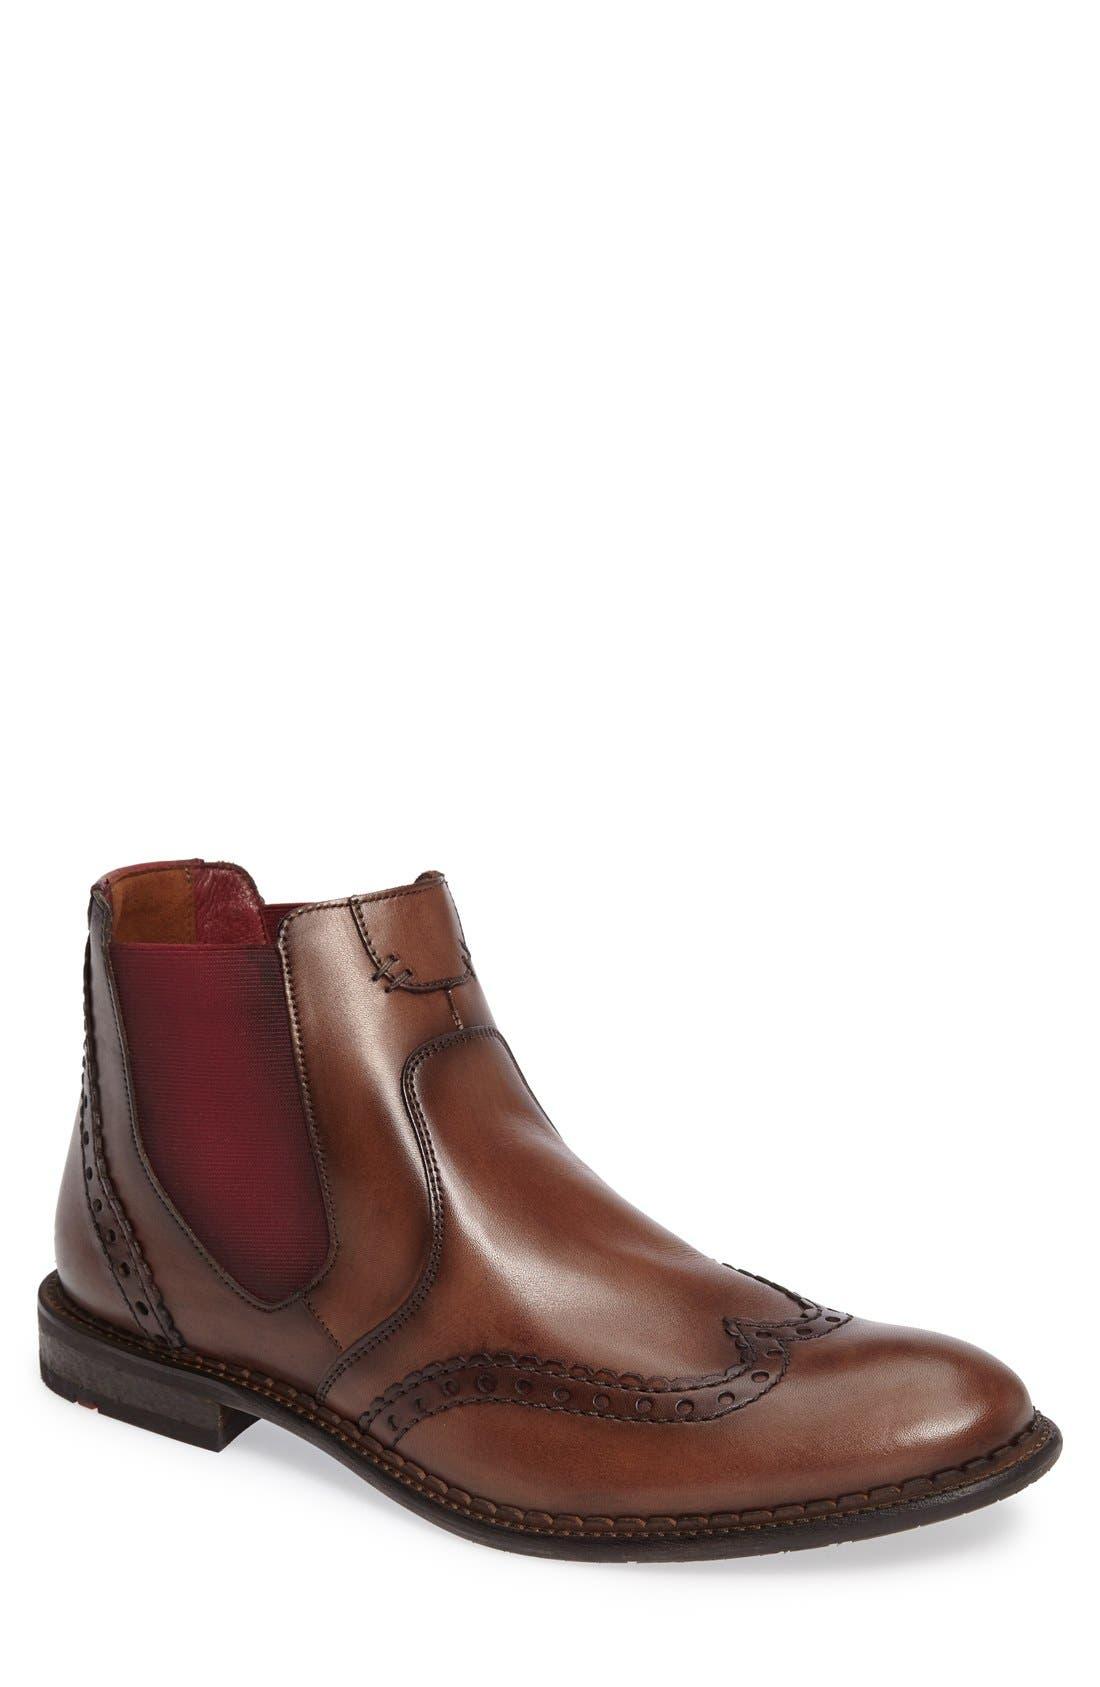 Alternate Image 1 Selected - Lloyd Grenoble Wingtip Chelsea Boot (Men)